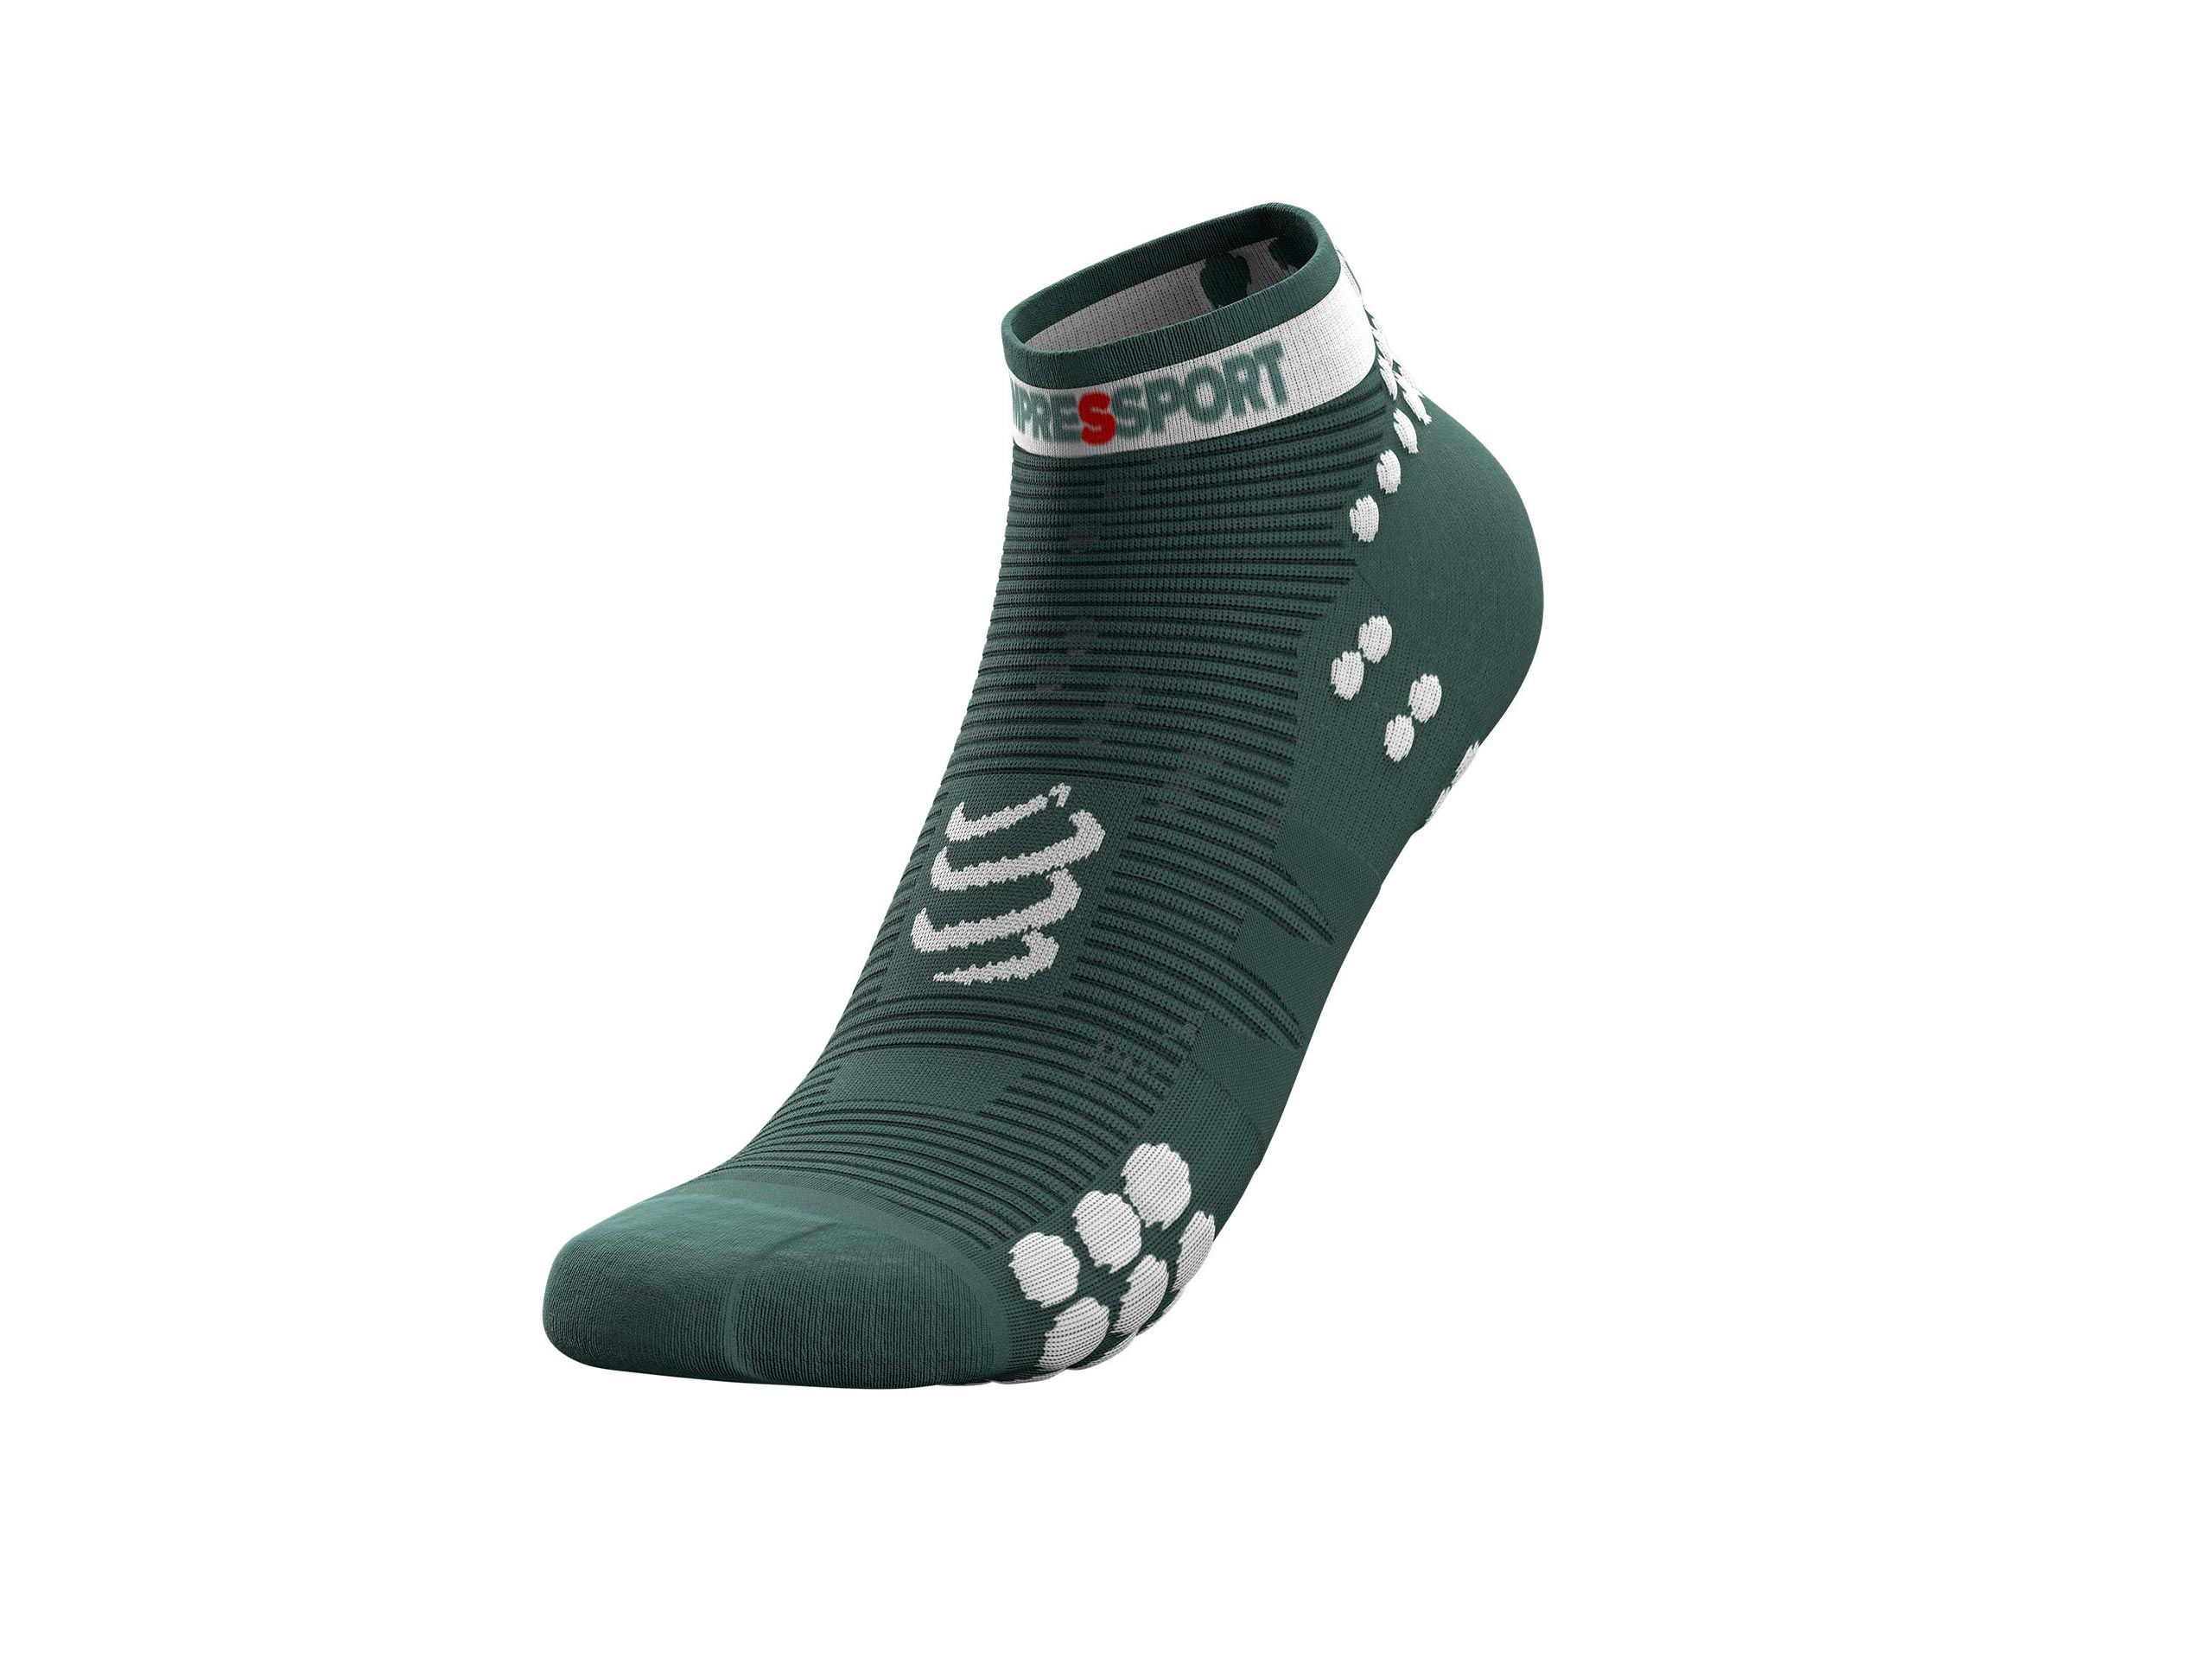 Pro Racing Socks v3.0 Run Low - Silver Pine / White